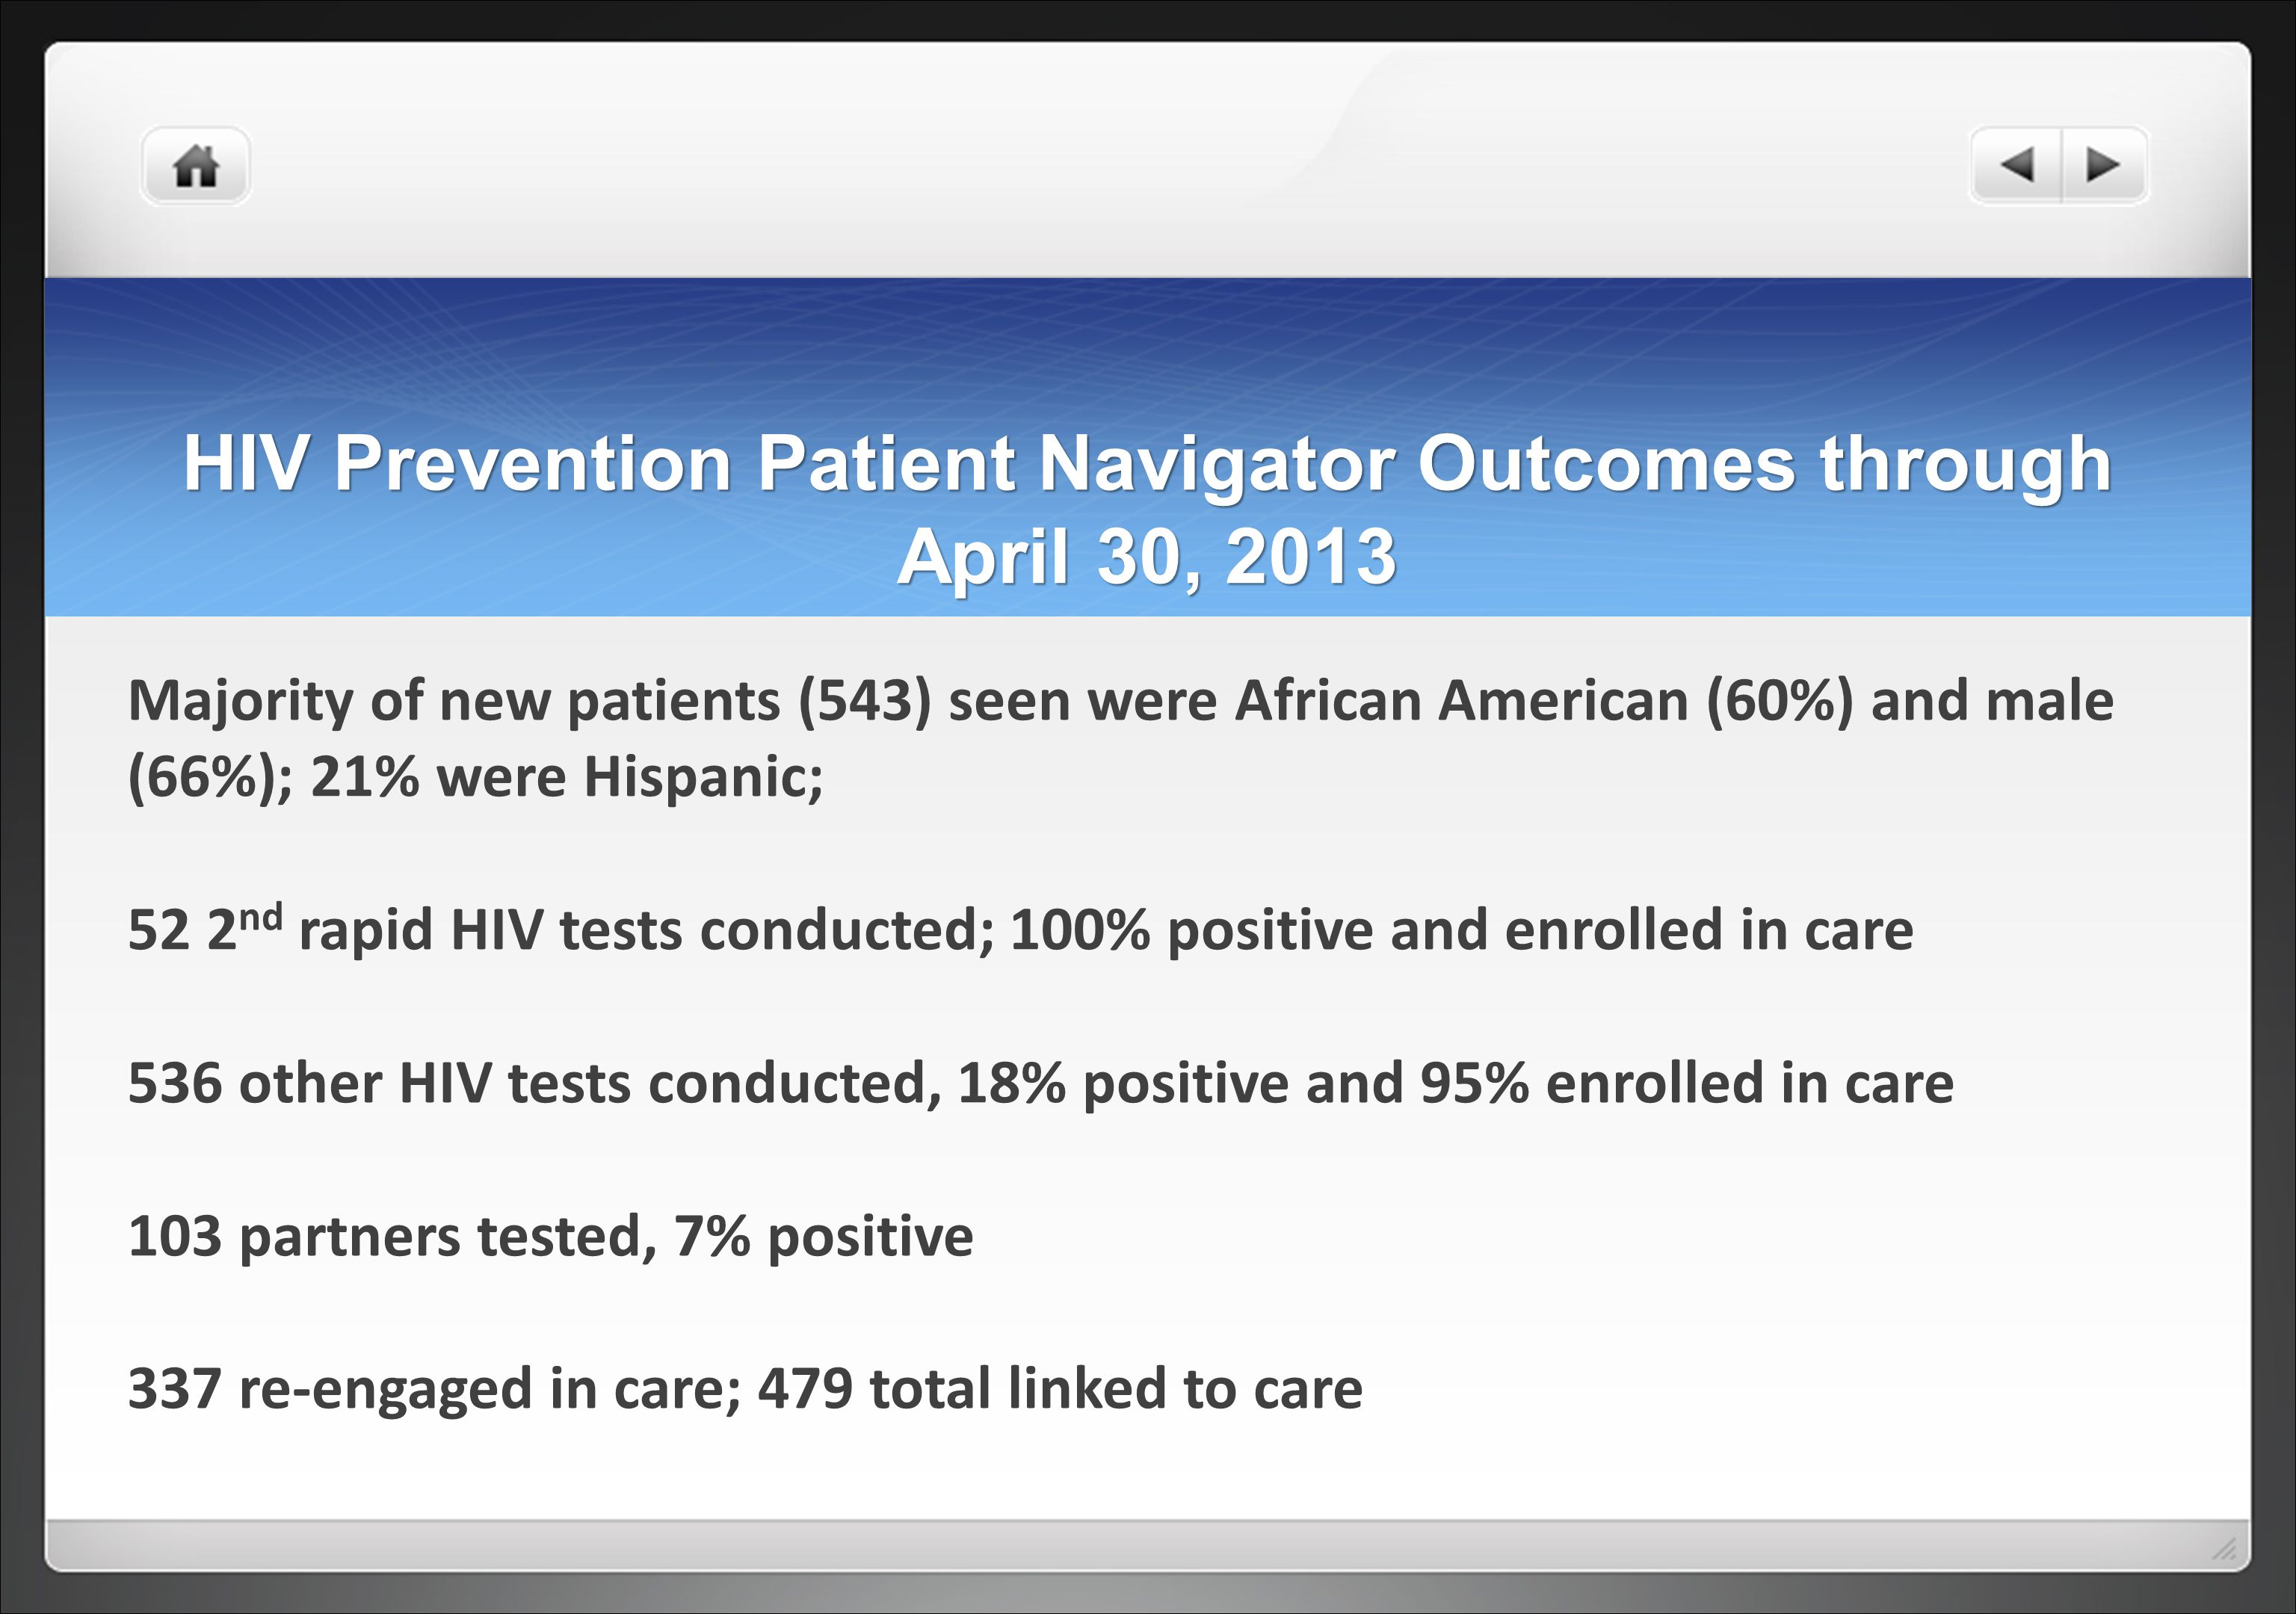 HIV Prevention Patient Navigator Outcomes through April 30, 2013